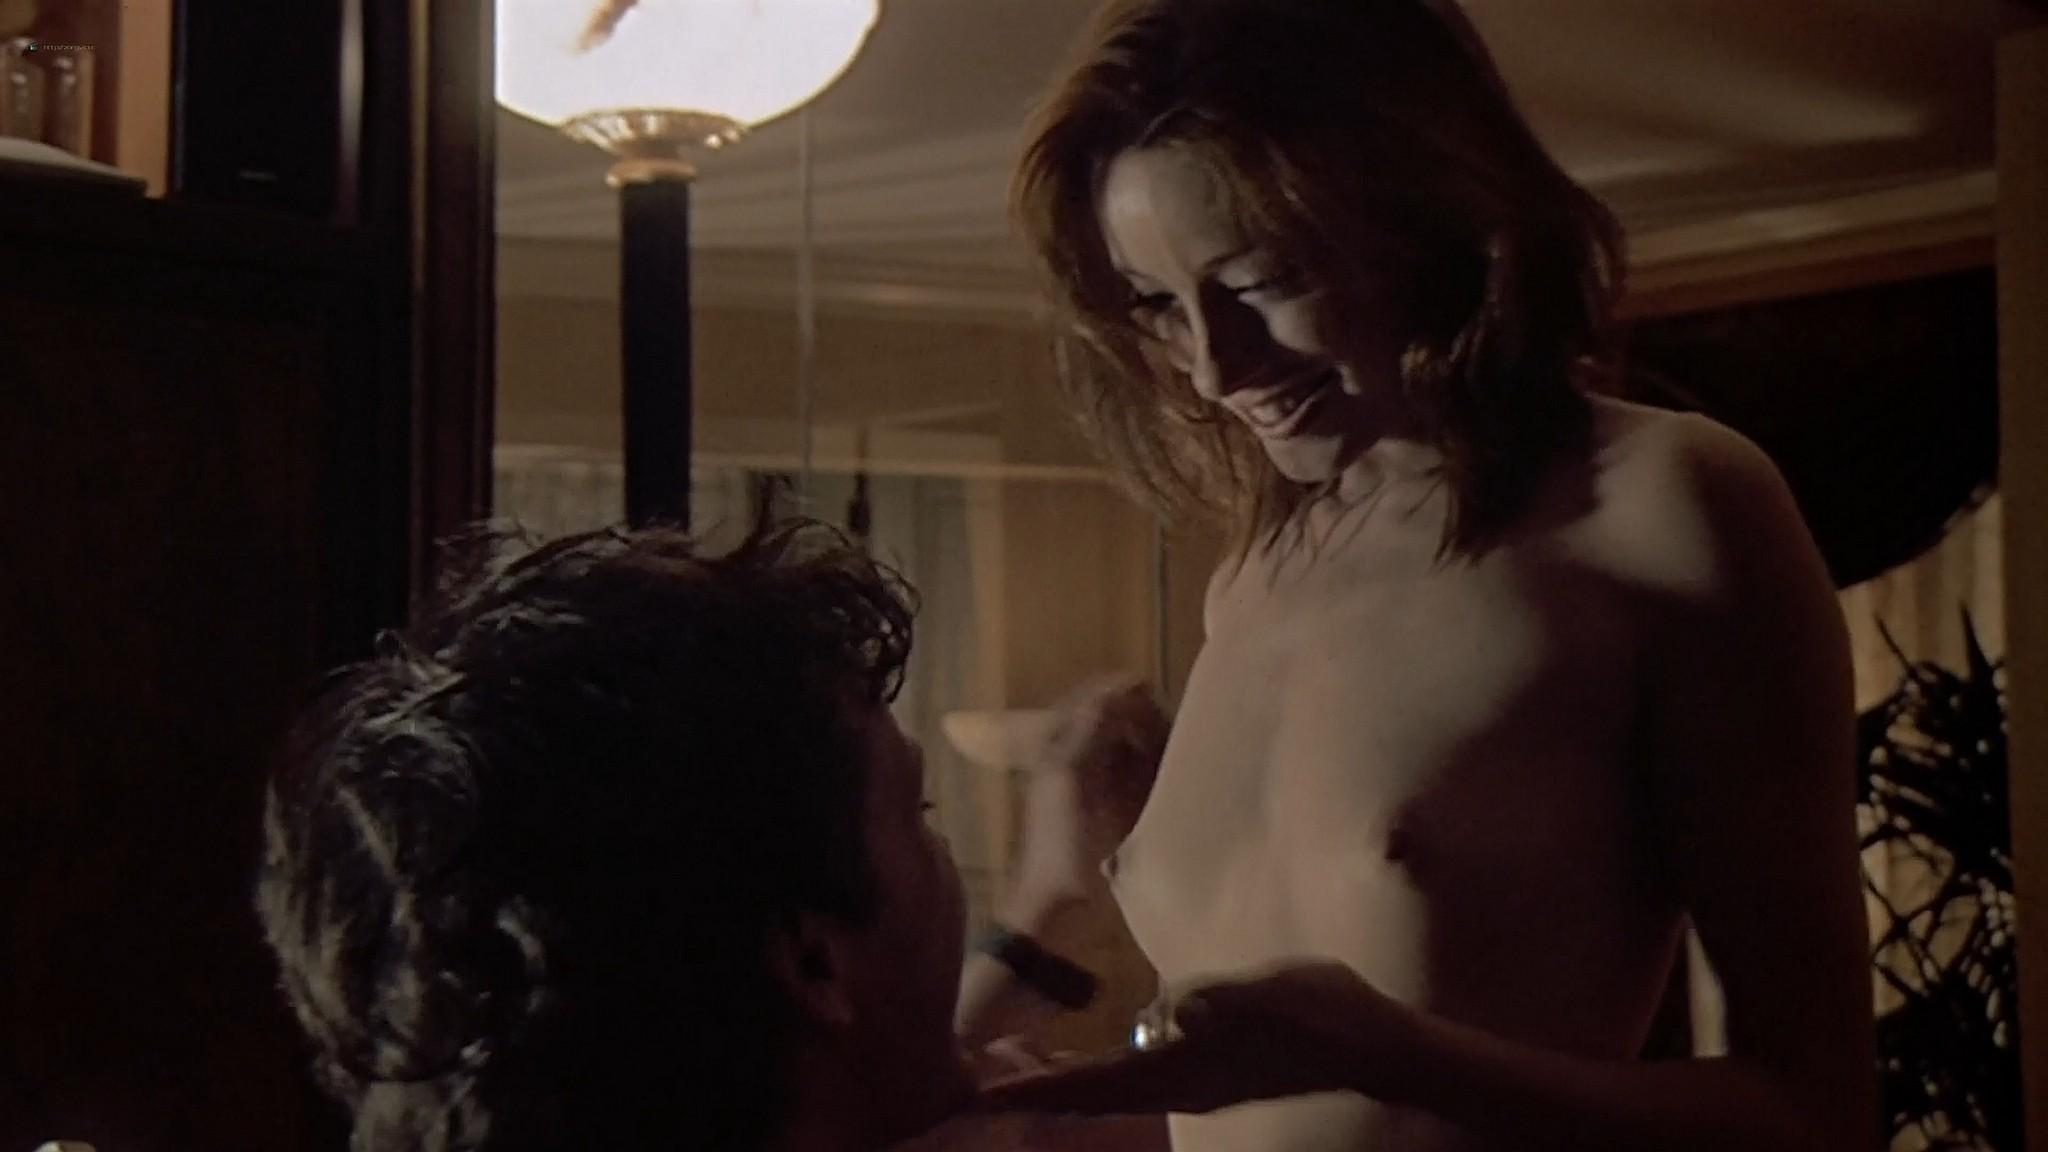 Molly Parker nude sex Alisha Klass explicit Carla Gugino sexy The Center of the World 2001 1080p 9